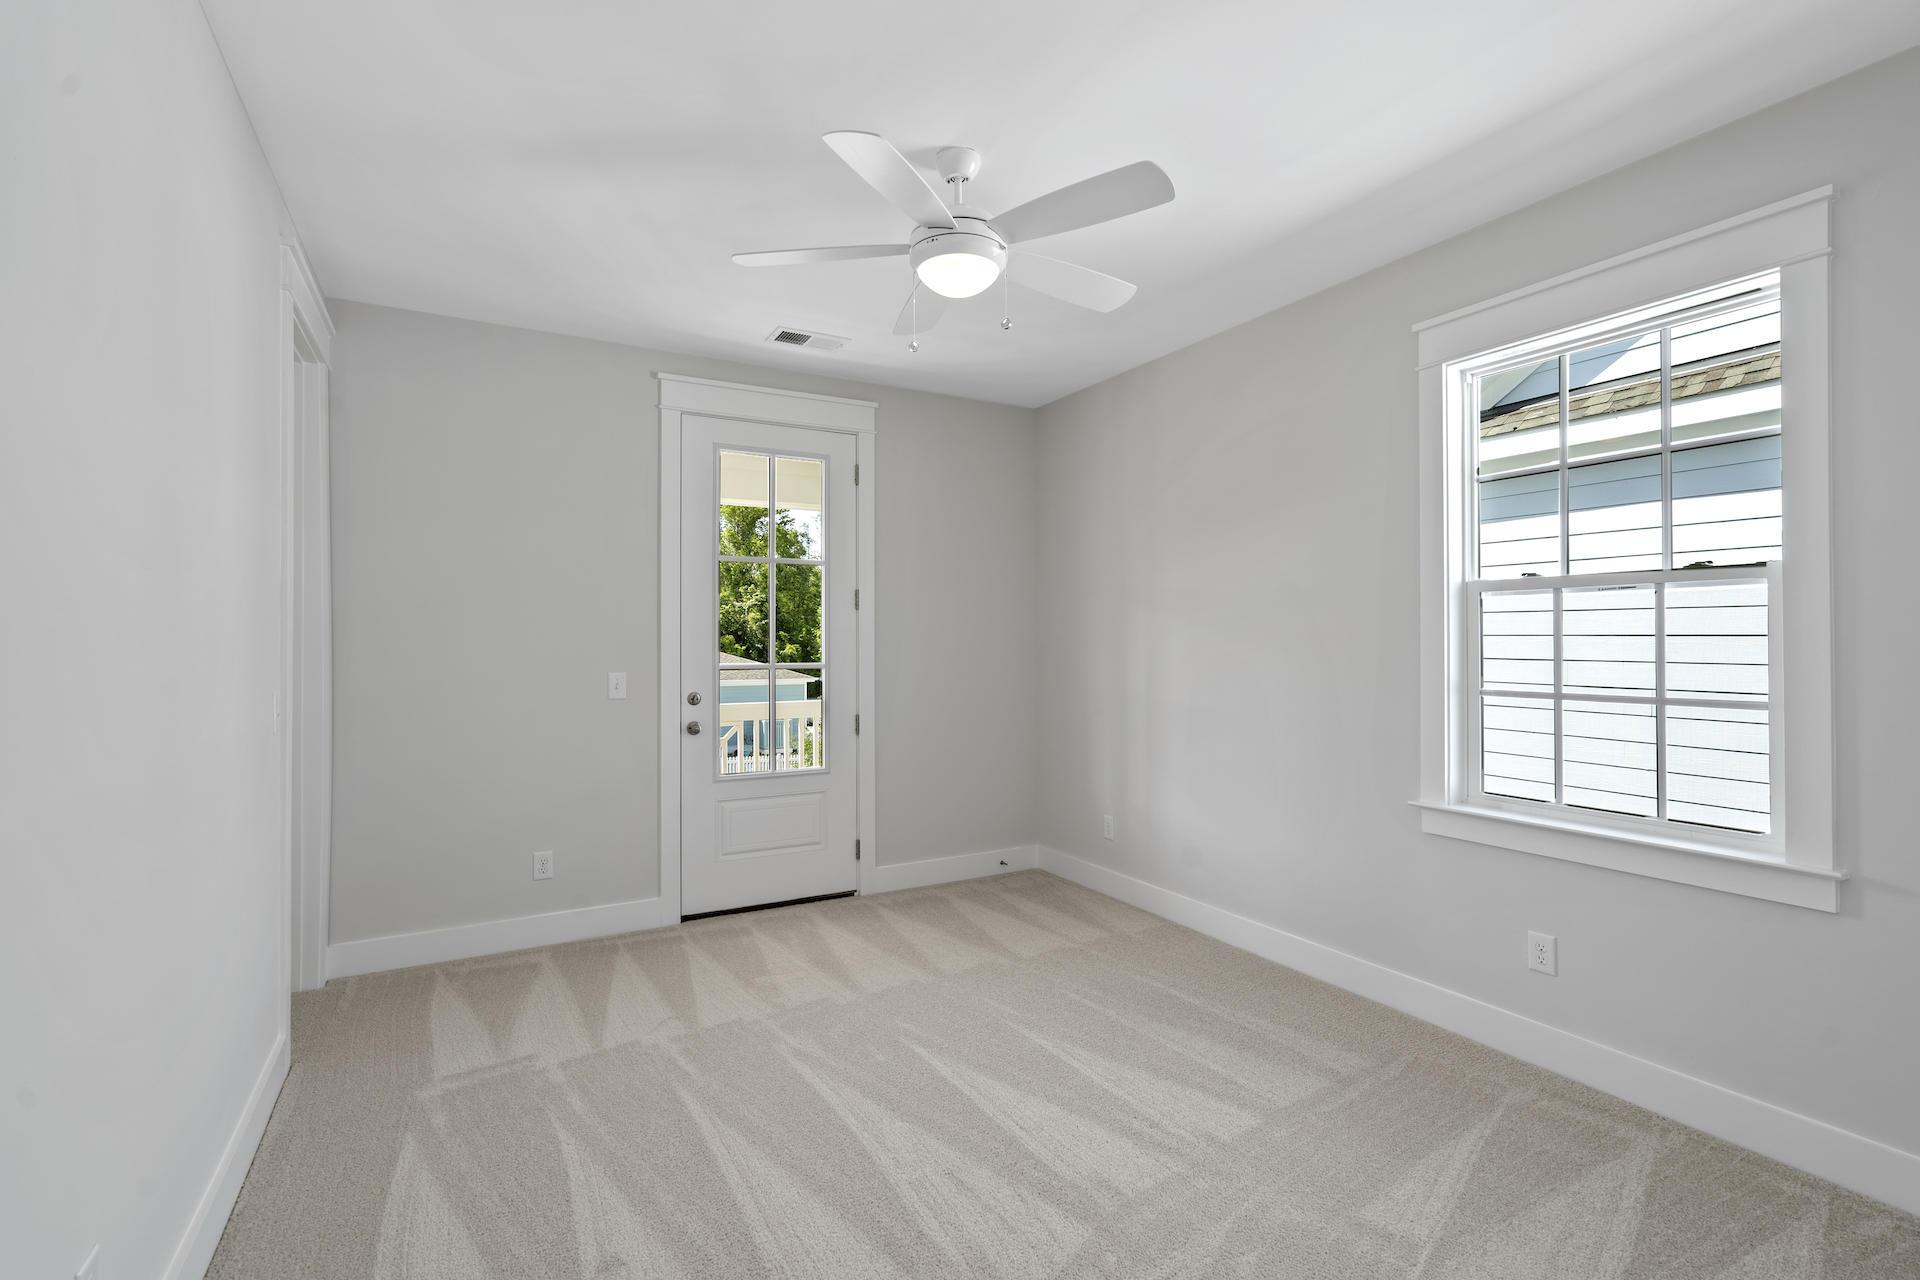 Midtown Homes For Sale - 1328 Upper Union, Mount Pleasant, SC - 5